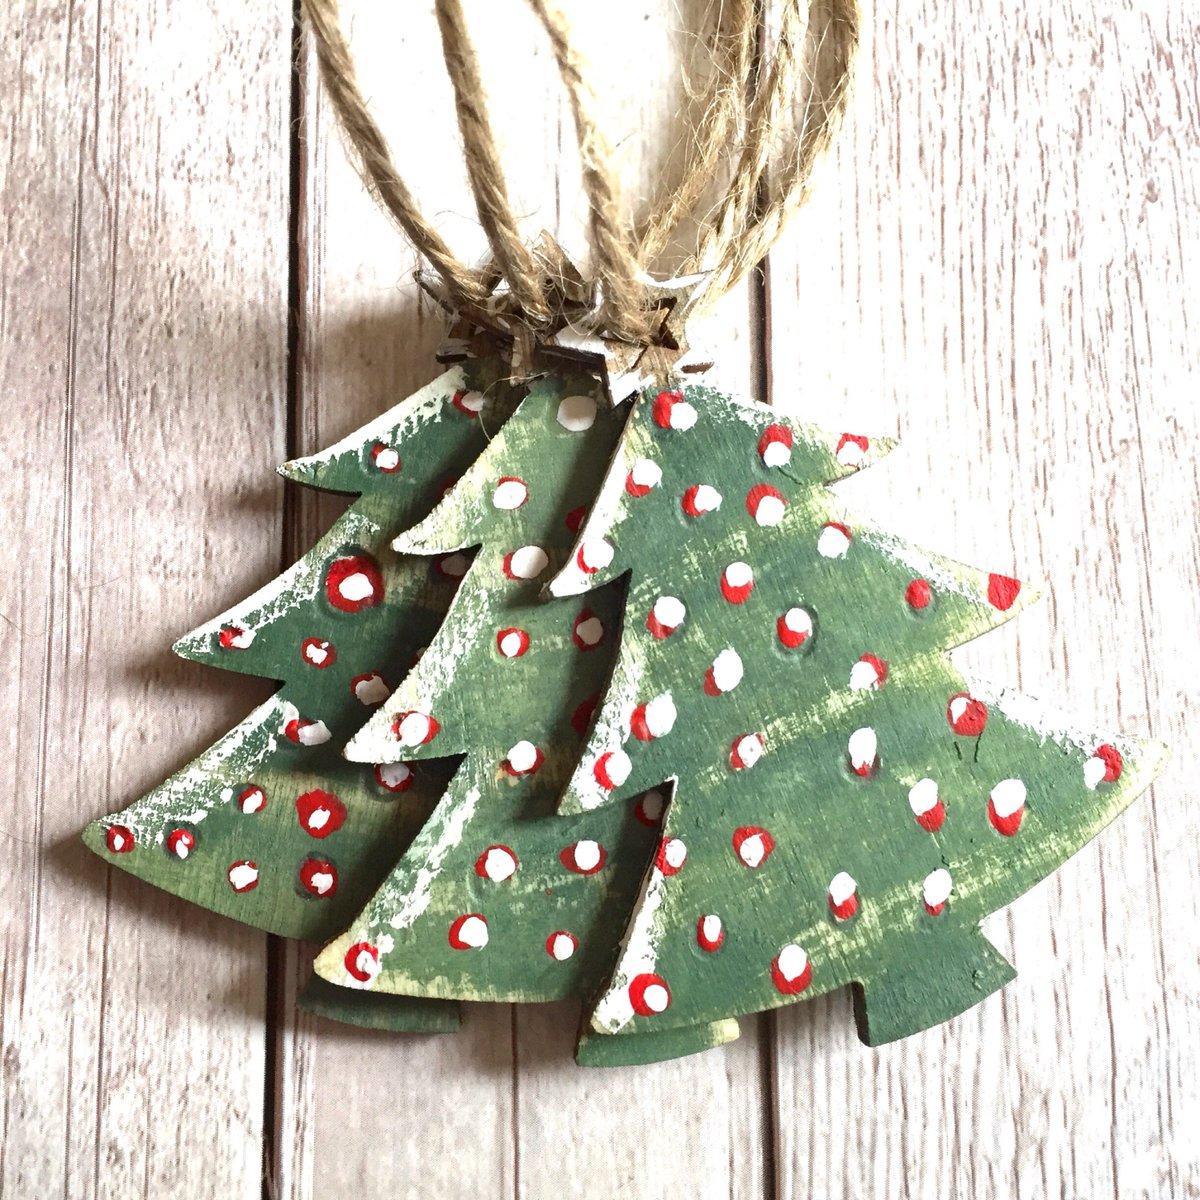 Slumbermonkey Design On Twitter Christmas Tree Decorations Set Of 3 Hand Painted Wooden Ornaments Ru Https T Co Ad6xkveb4a Etsy Woodlanddecor